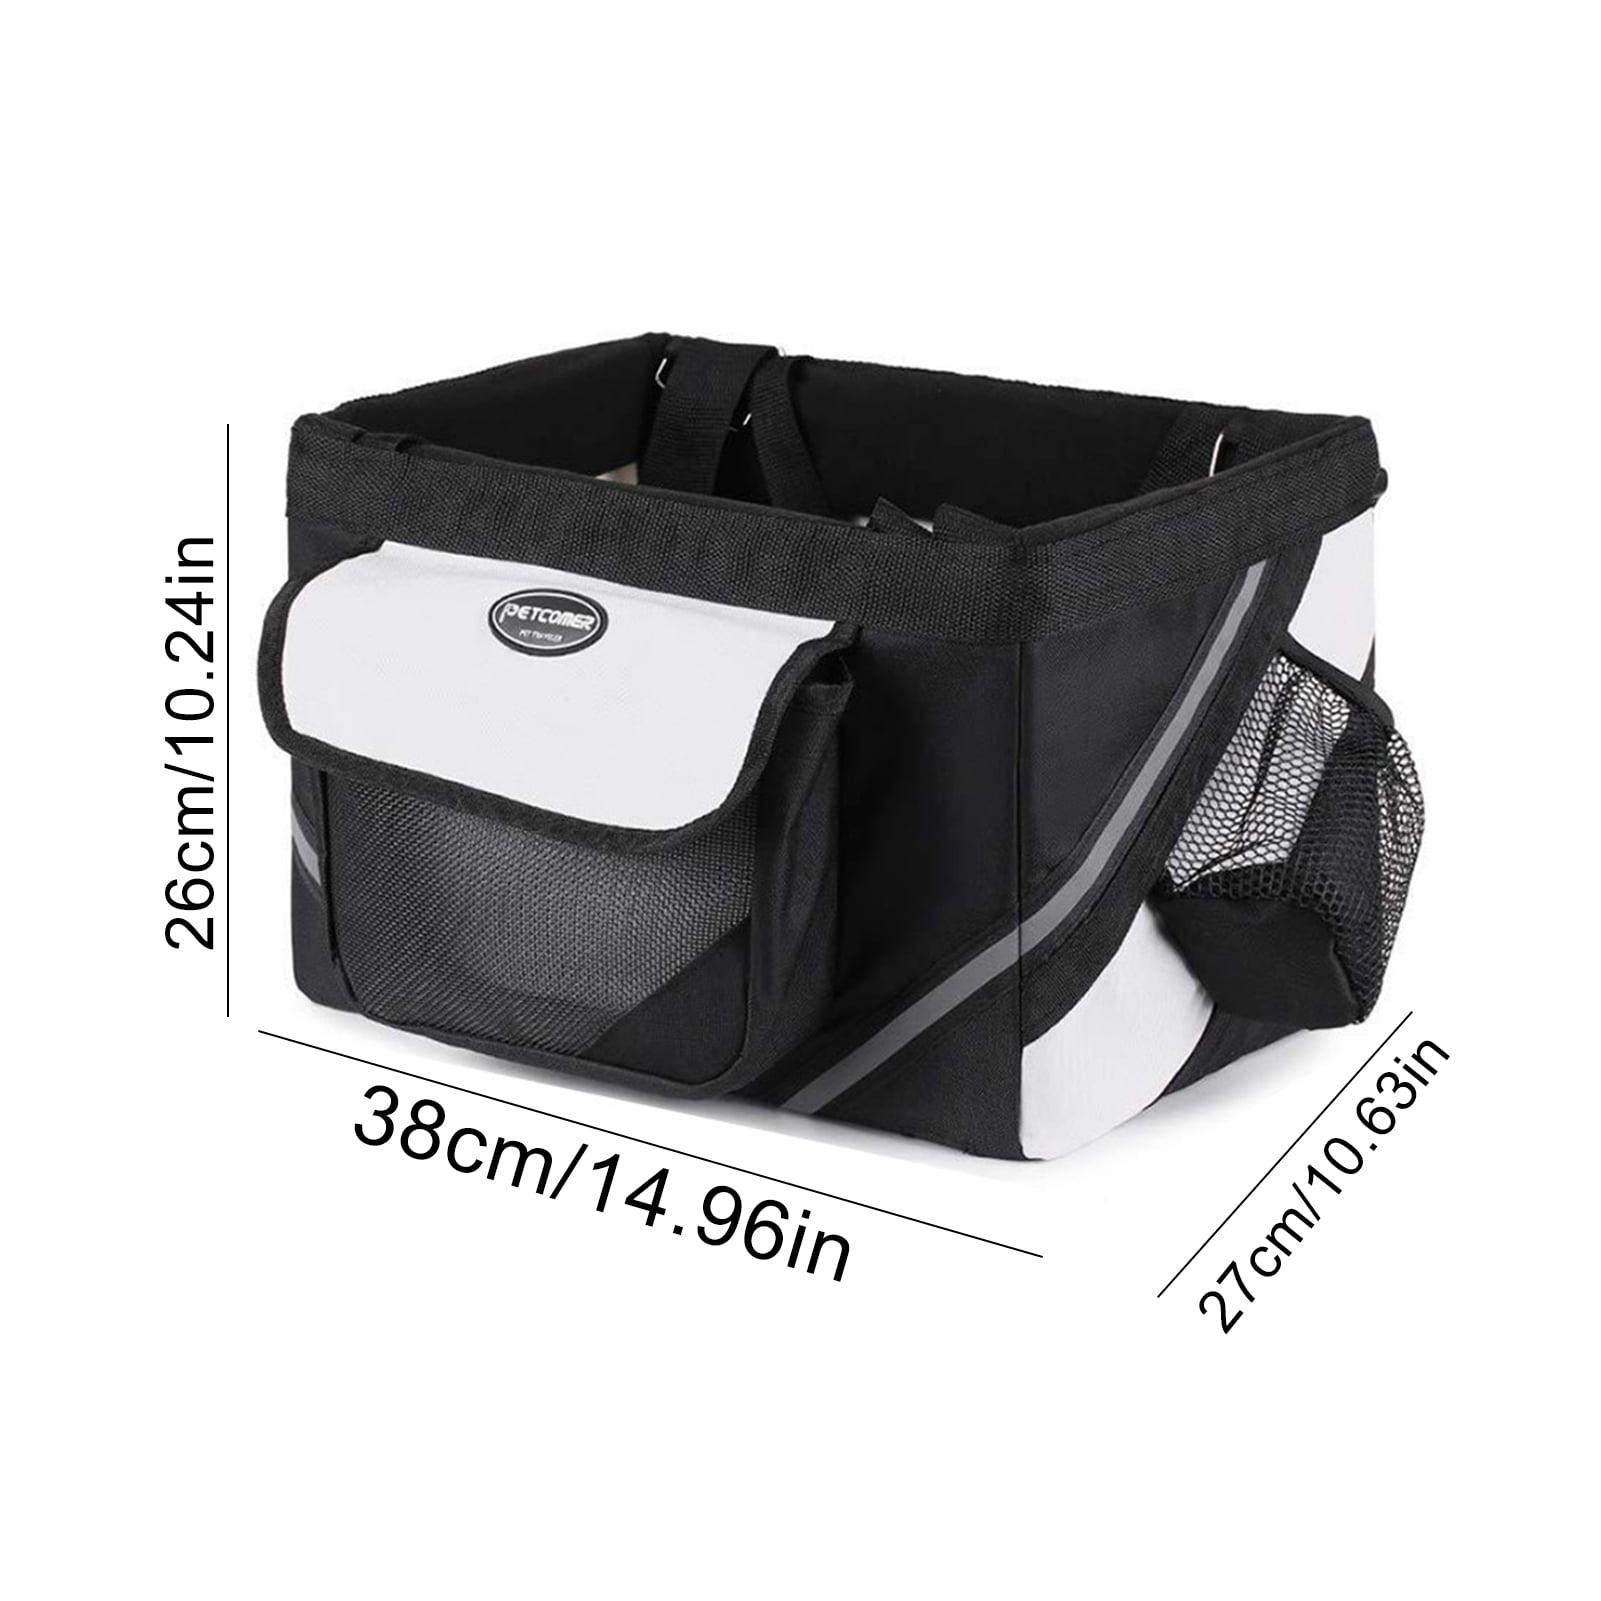 Details about  /Bike Basket Mount Bicycle Front Pet Carrier Mounting Holder Pet Quick V9C6